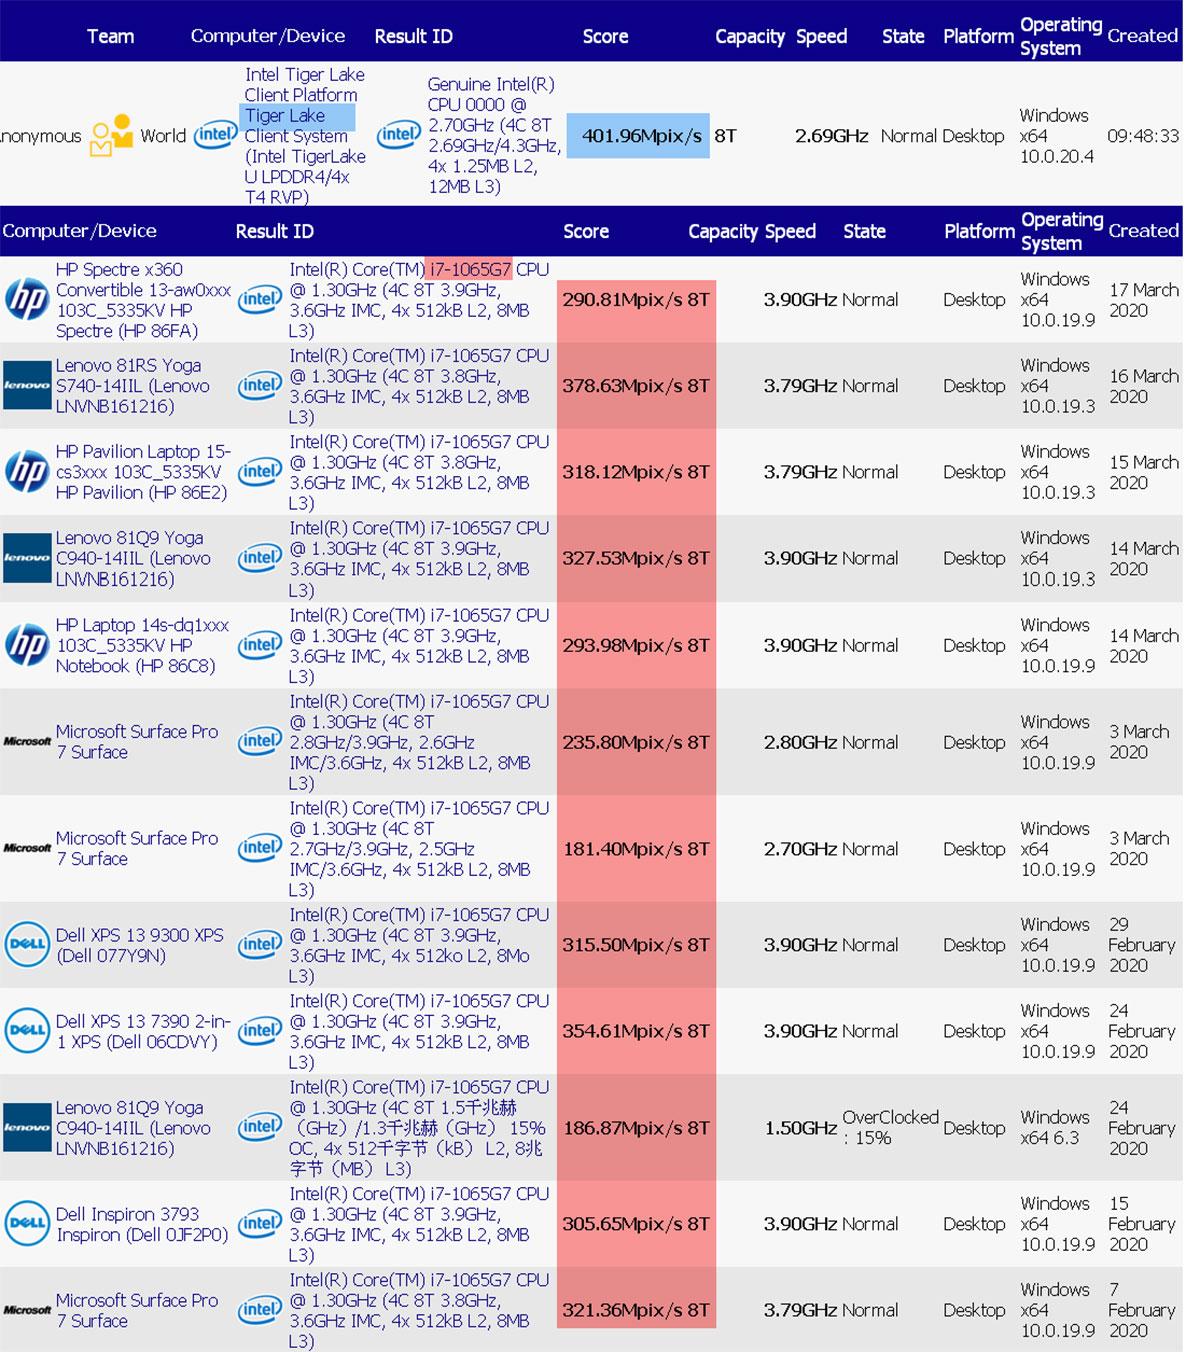 http://us.cdn.persiangig.com/preview/uqsiZWkEbD/60.jpg